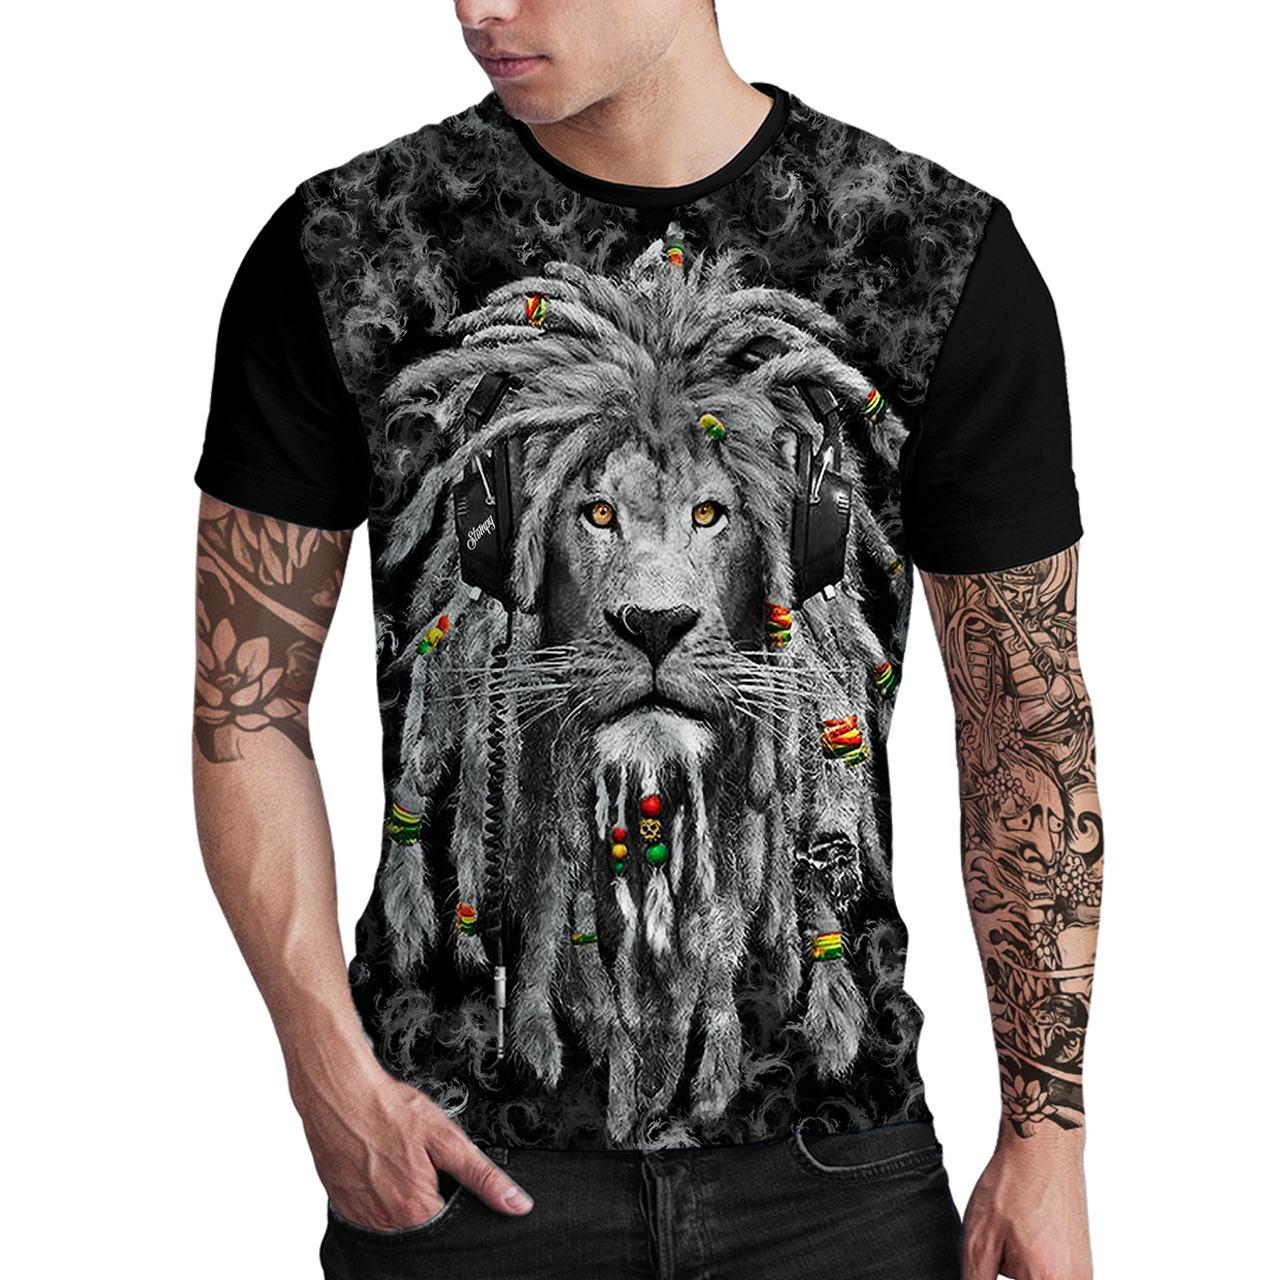 Stompy Camiseta Estampada Masculina Modelo 106